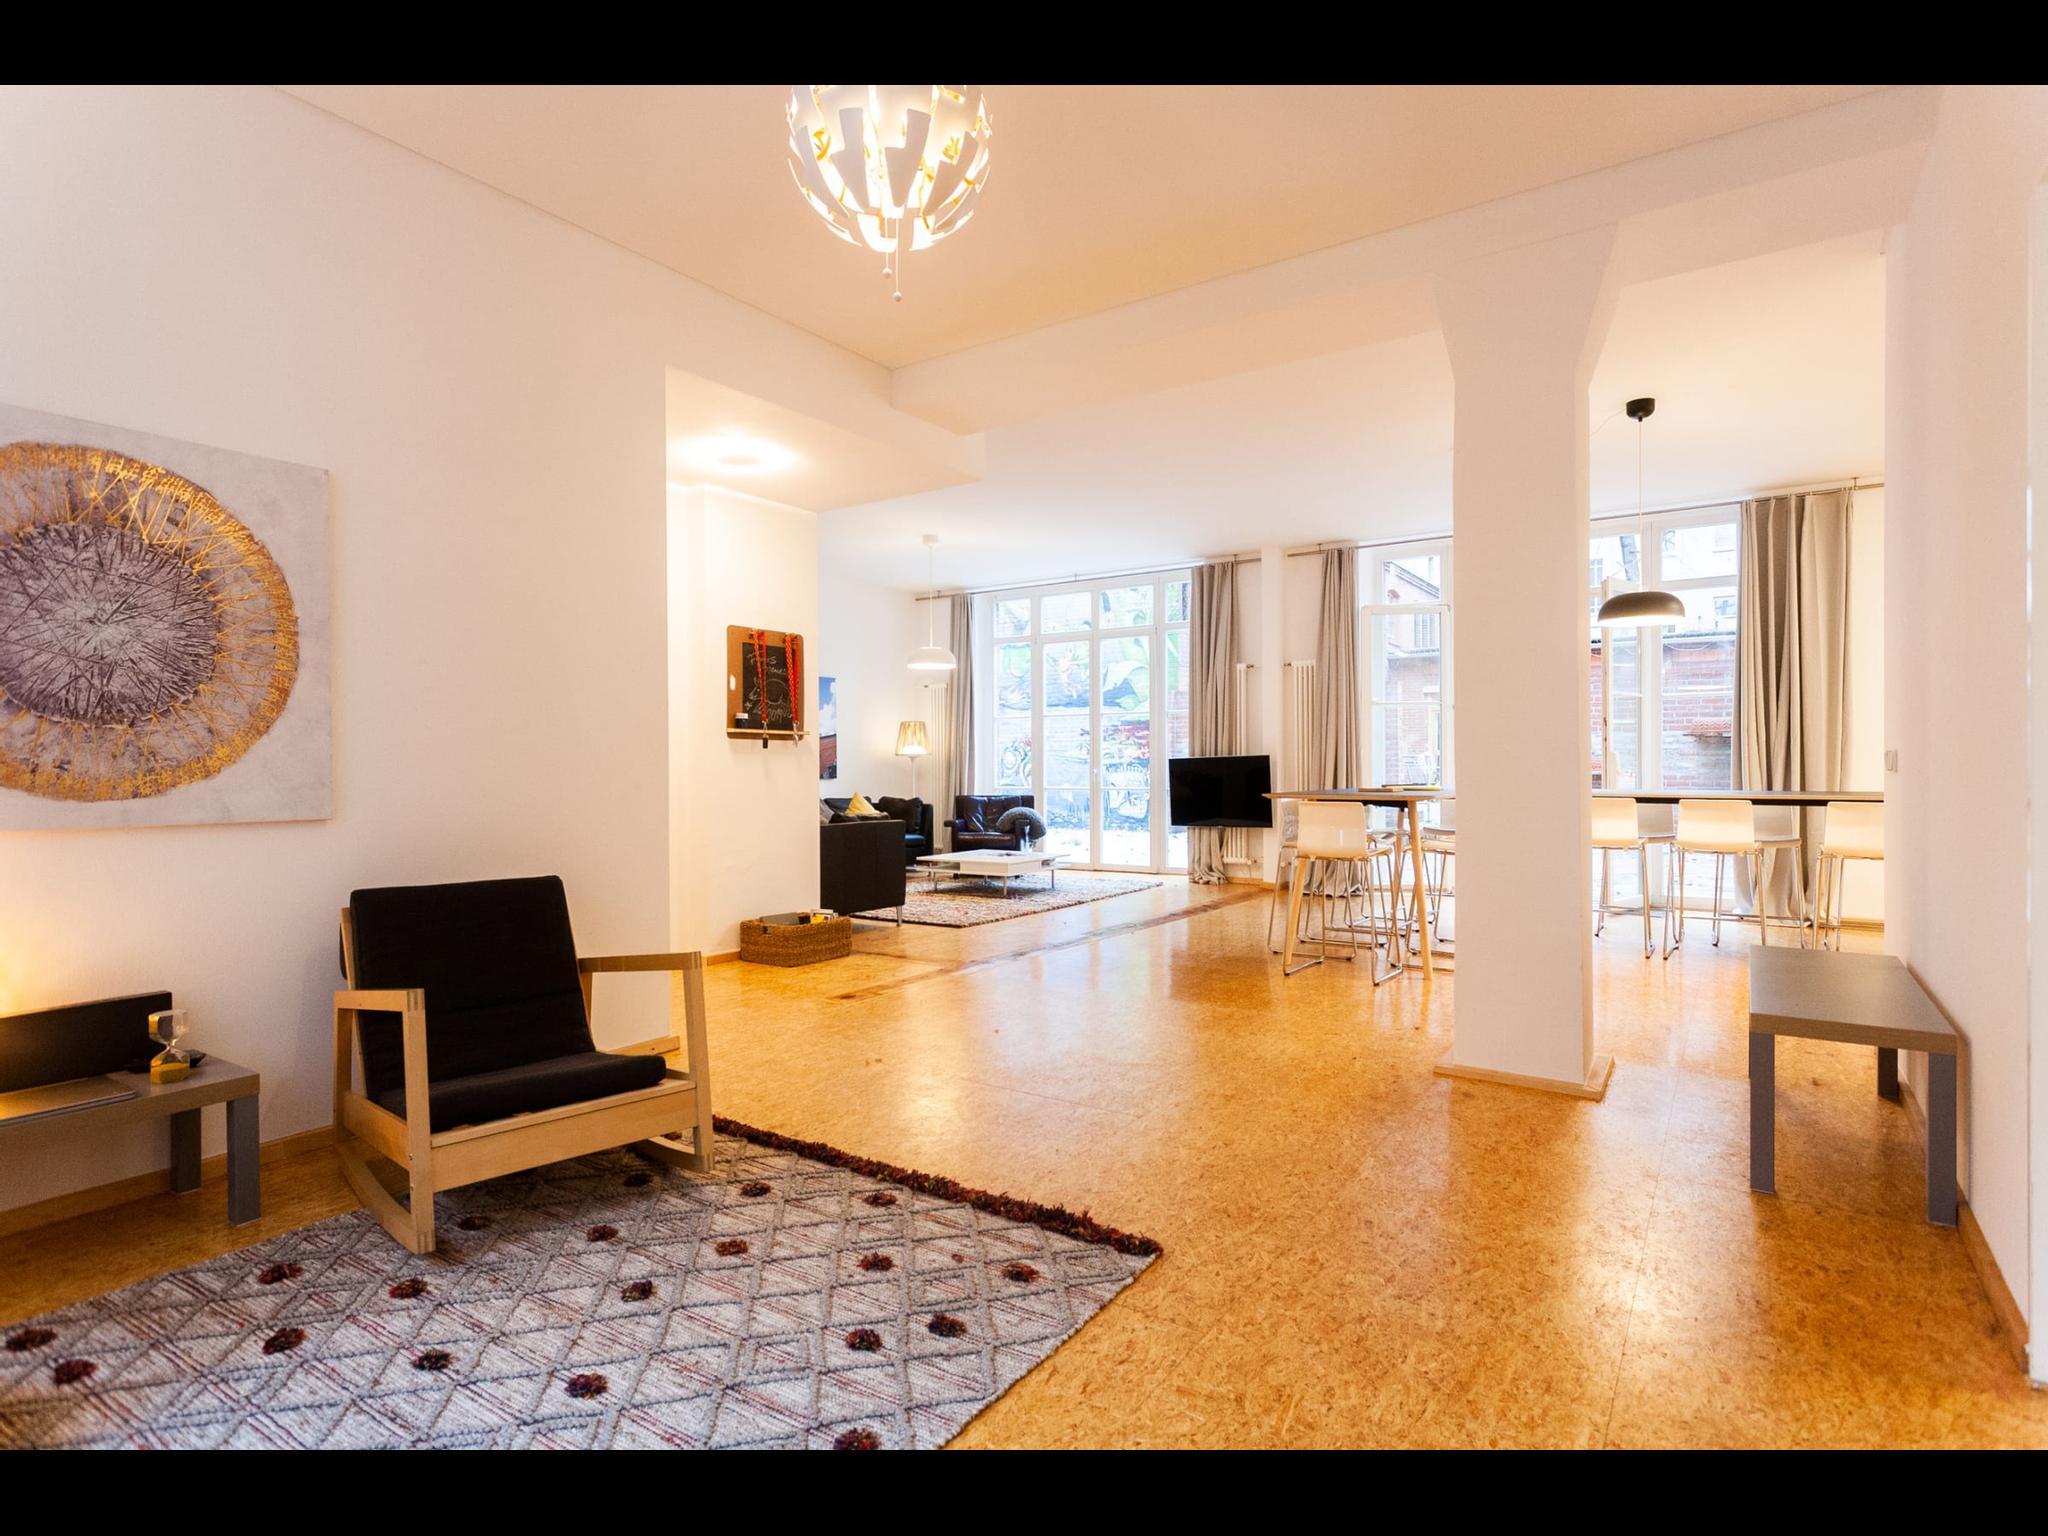 Stephan - Exclusive loft in Berlin